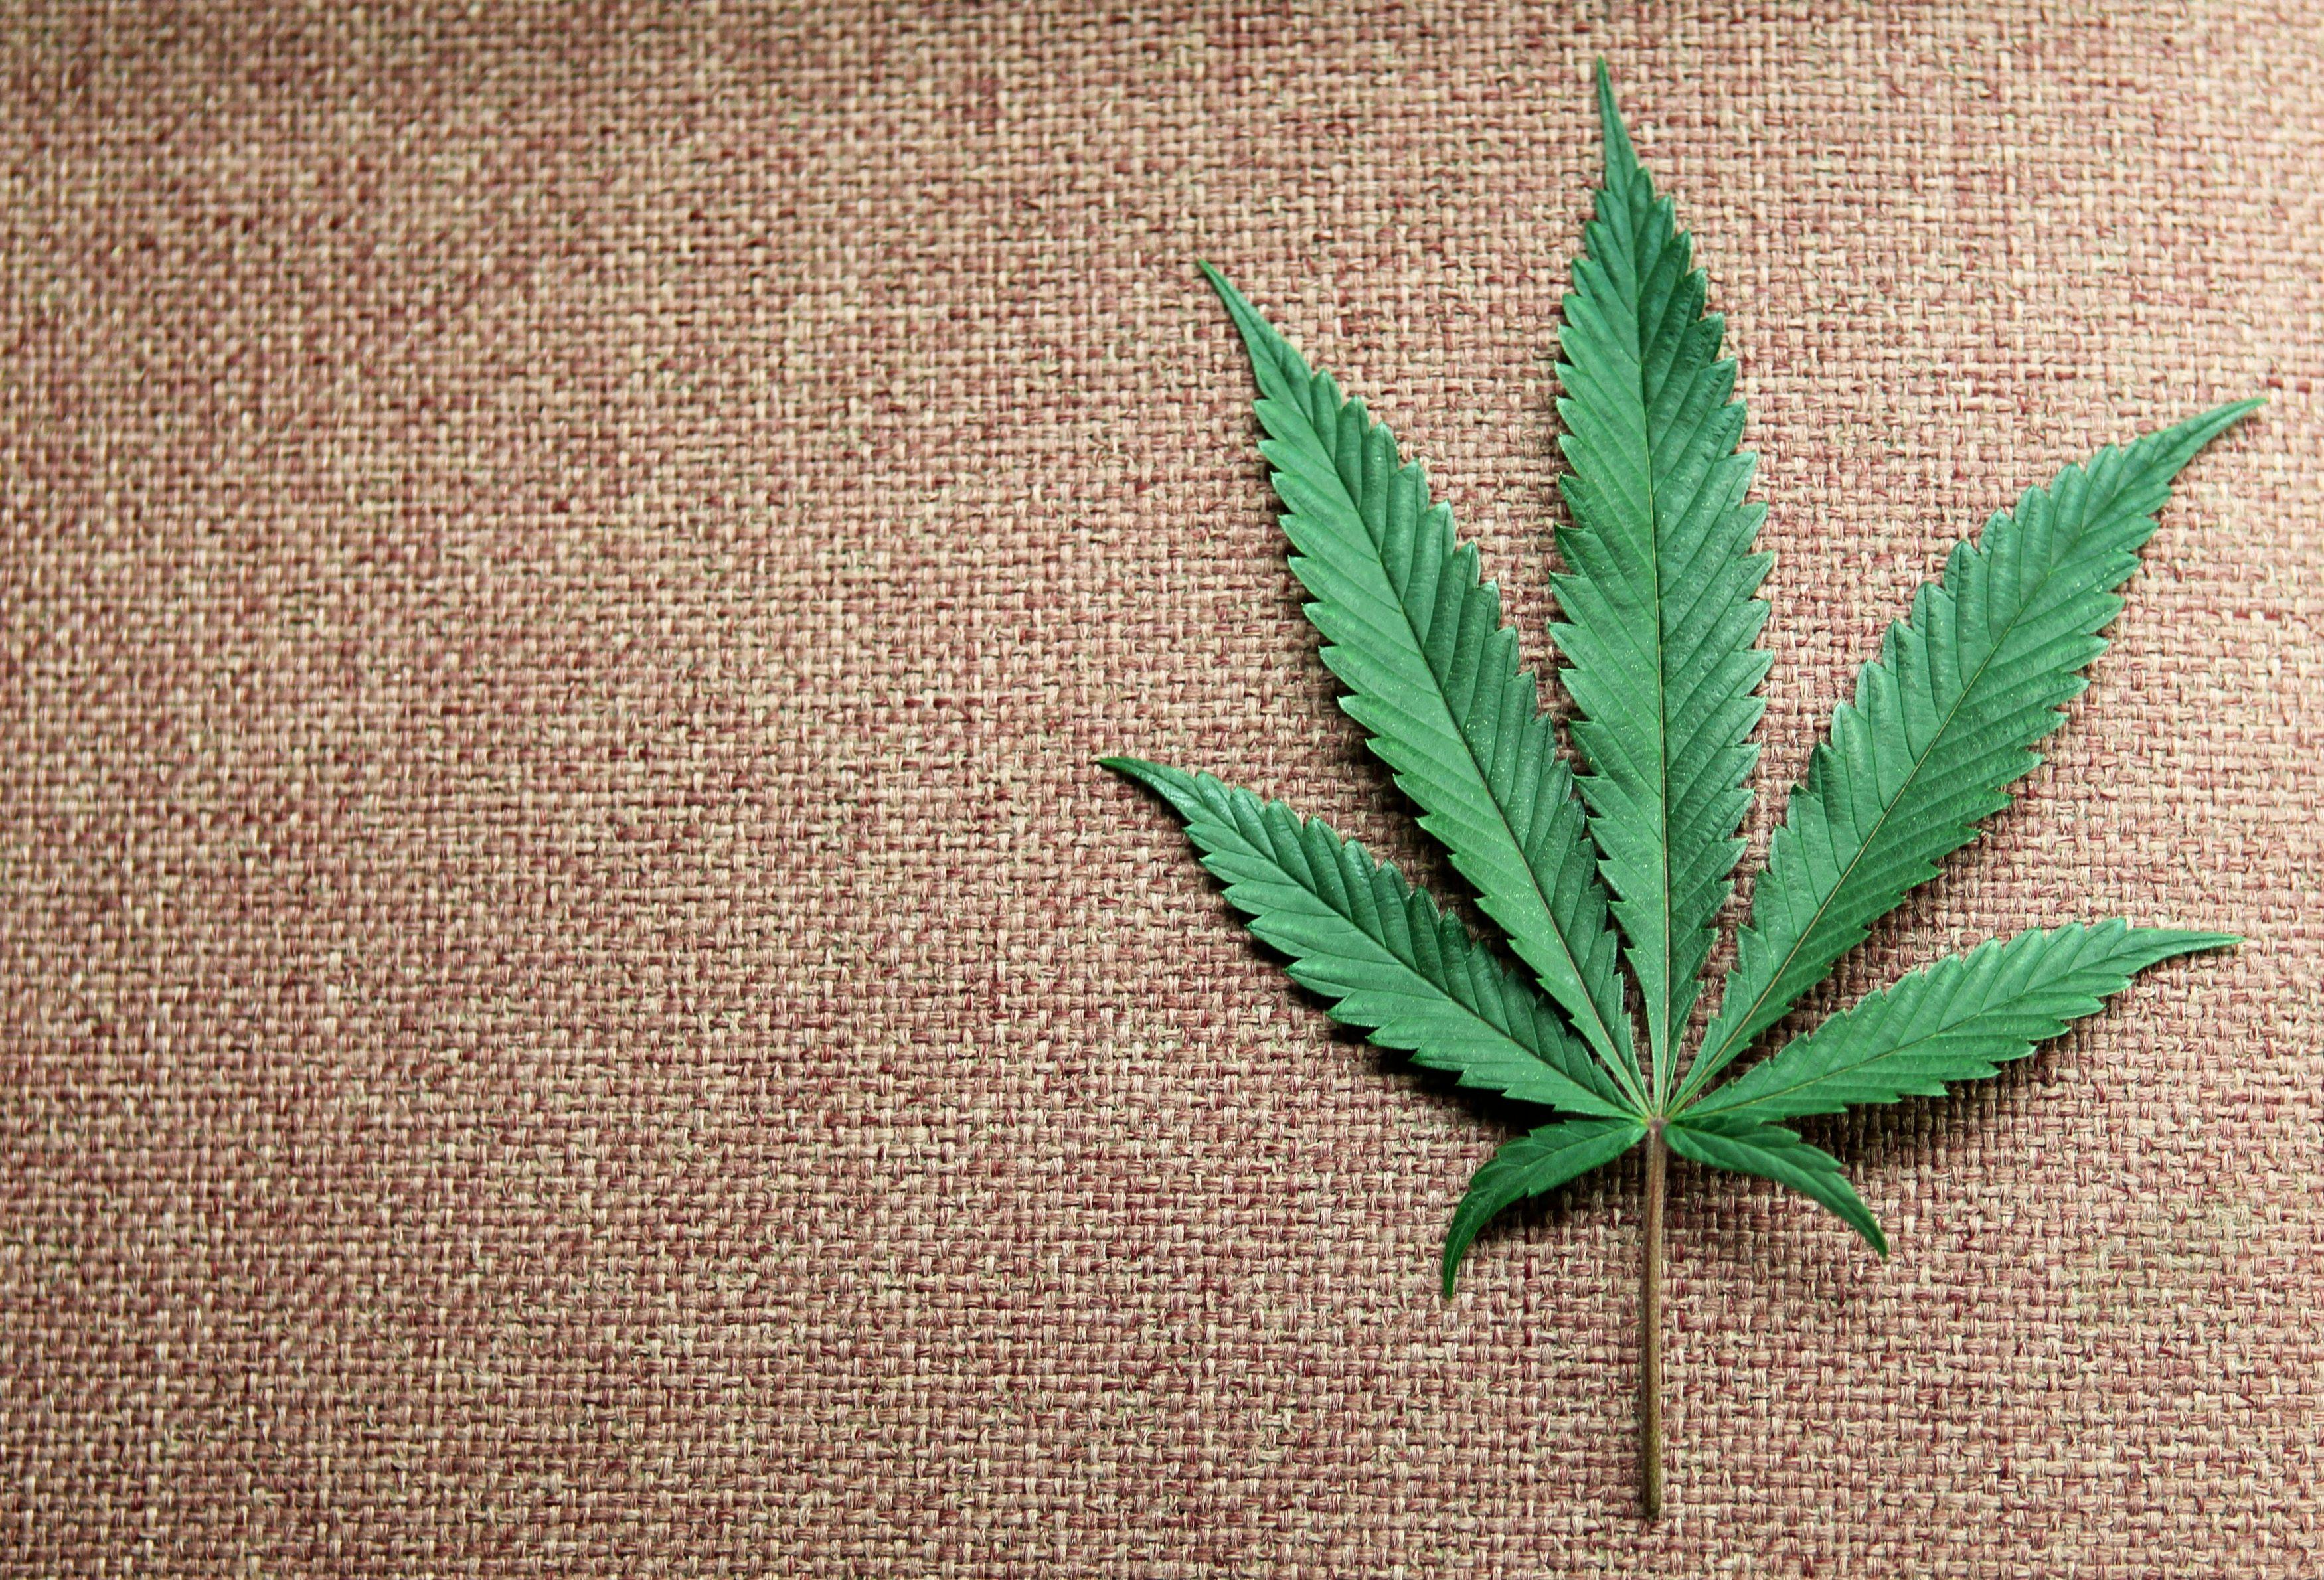 Énorme saisie de cannabis sur un navire en Méditerranée